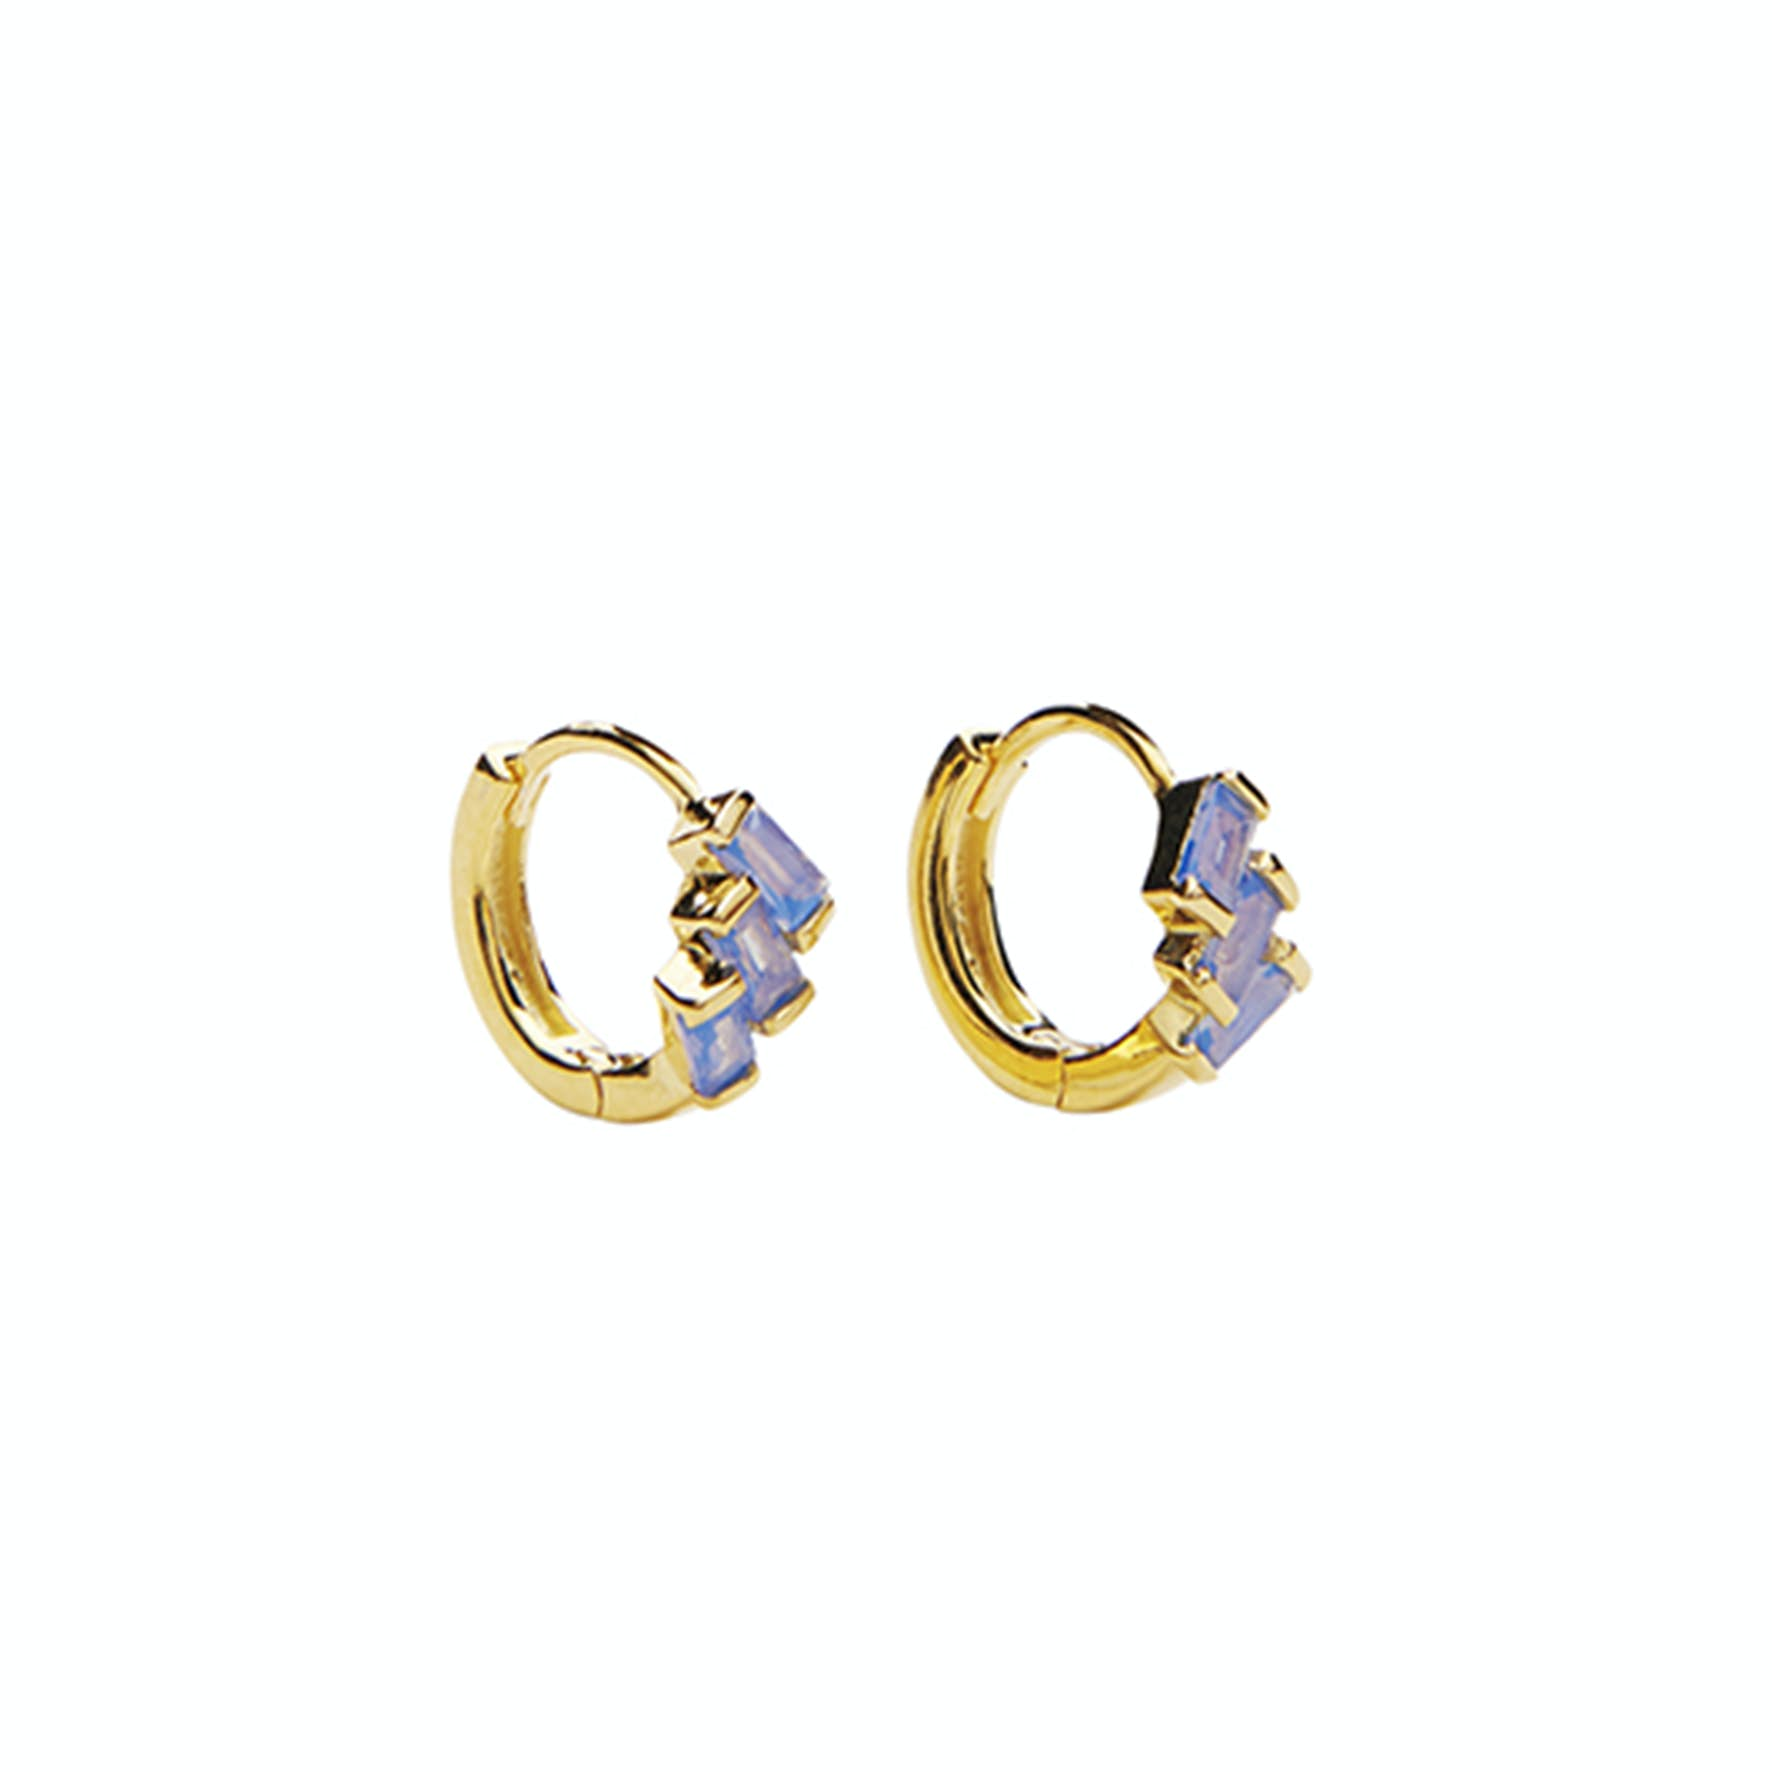 Mirach Crystal Blue Hoops fra Pico i Forgyldt-Sølv Sterling 925